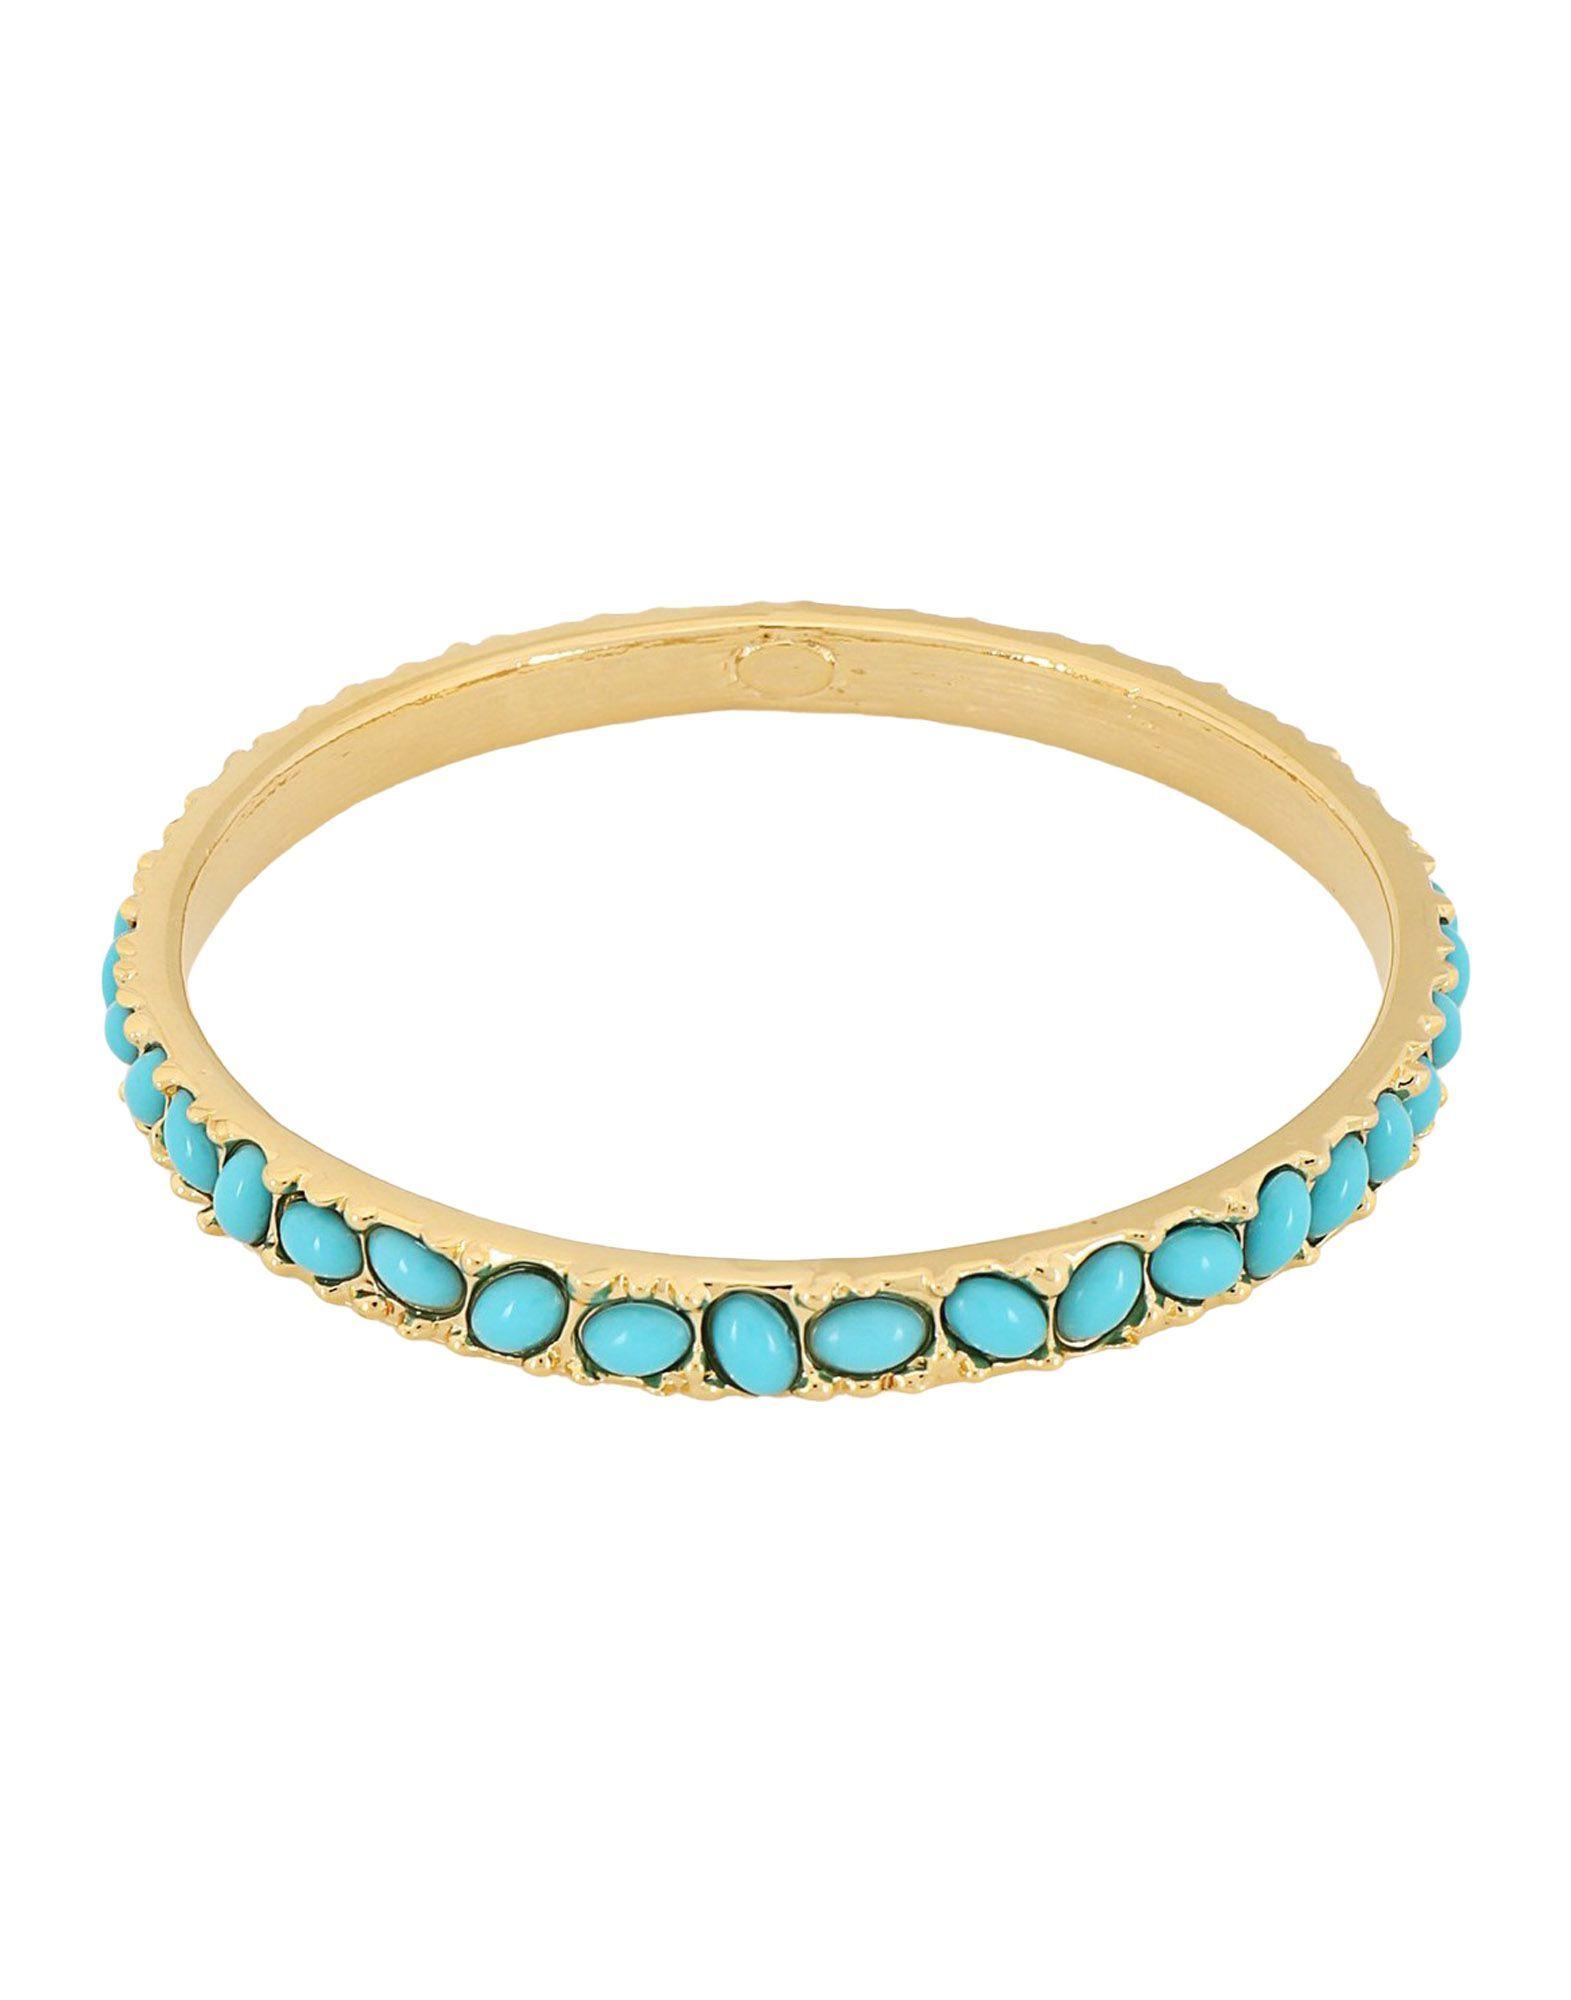 Kenneth Jay Lane Turquoise Gold Plated Bracelet